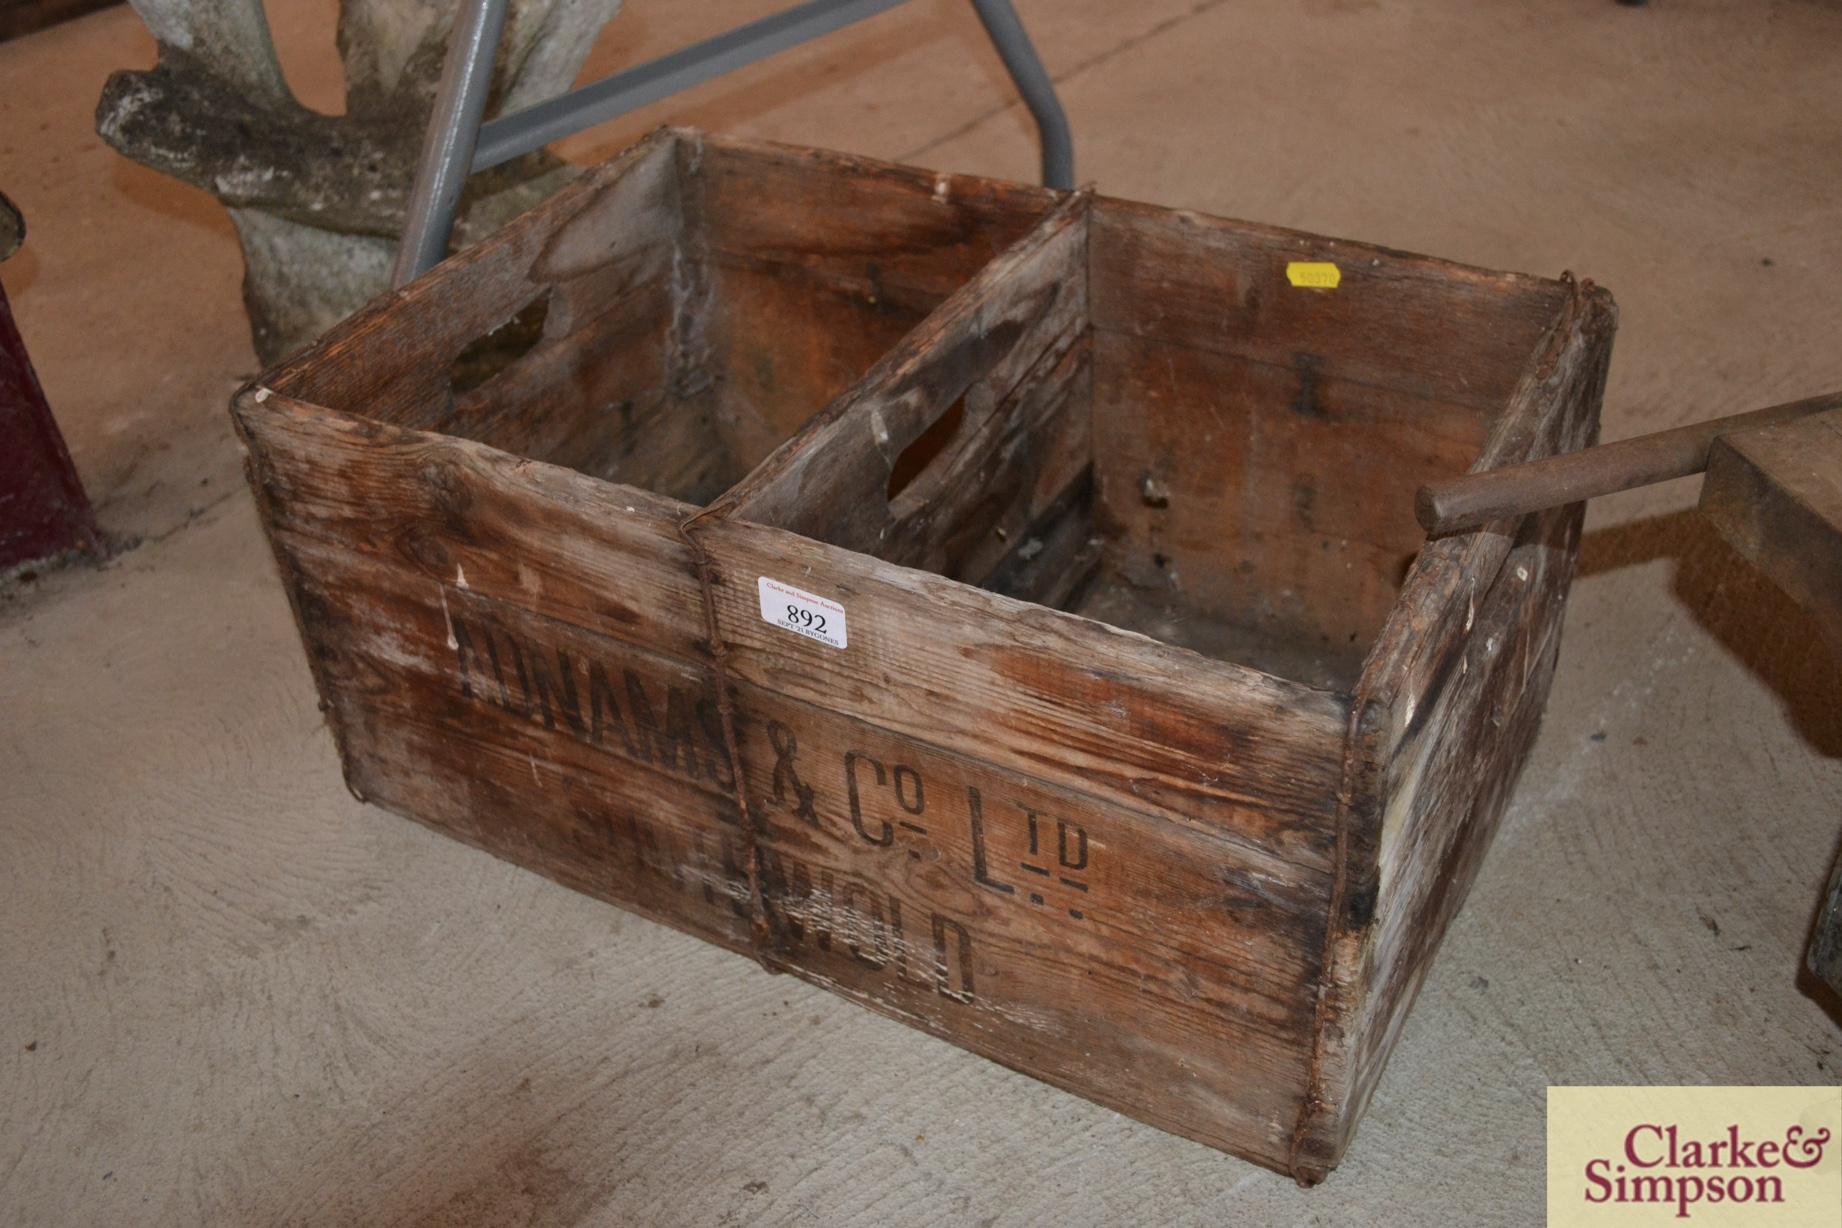 An Adnams & Co. Ltd. Southwold advertising crate